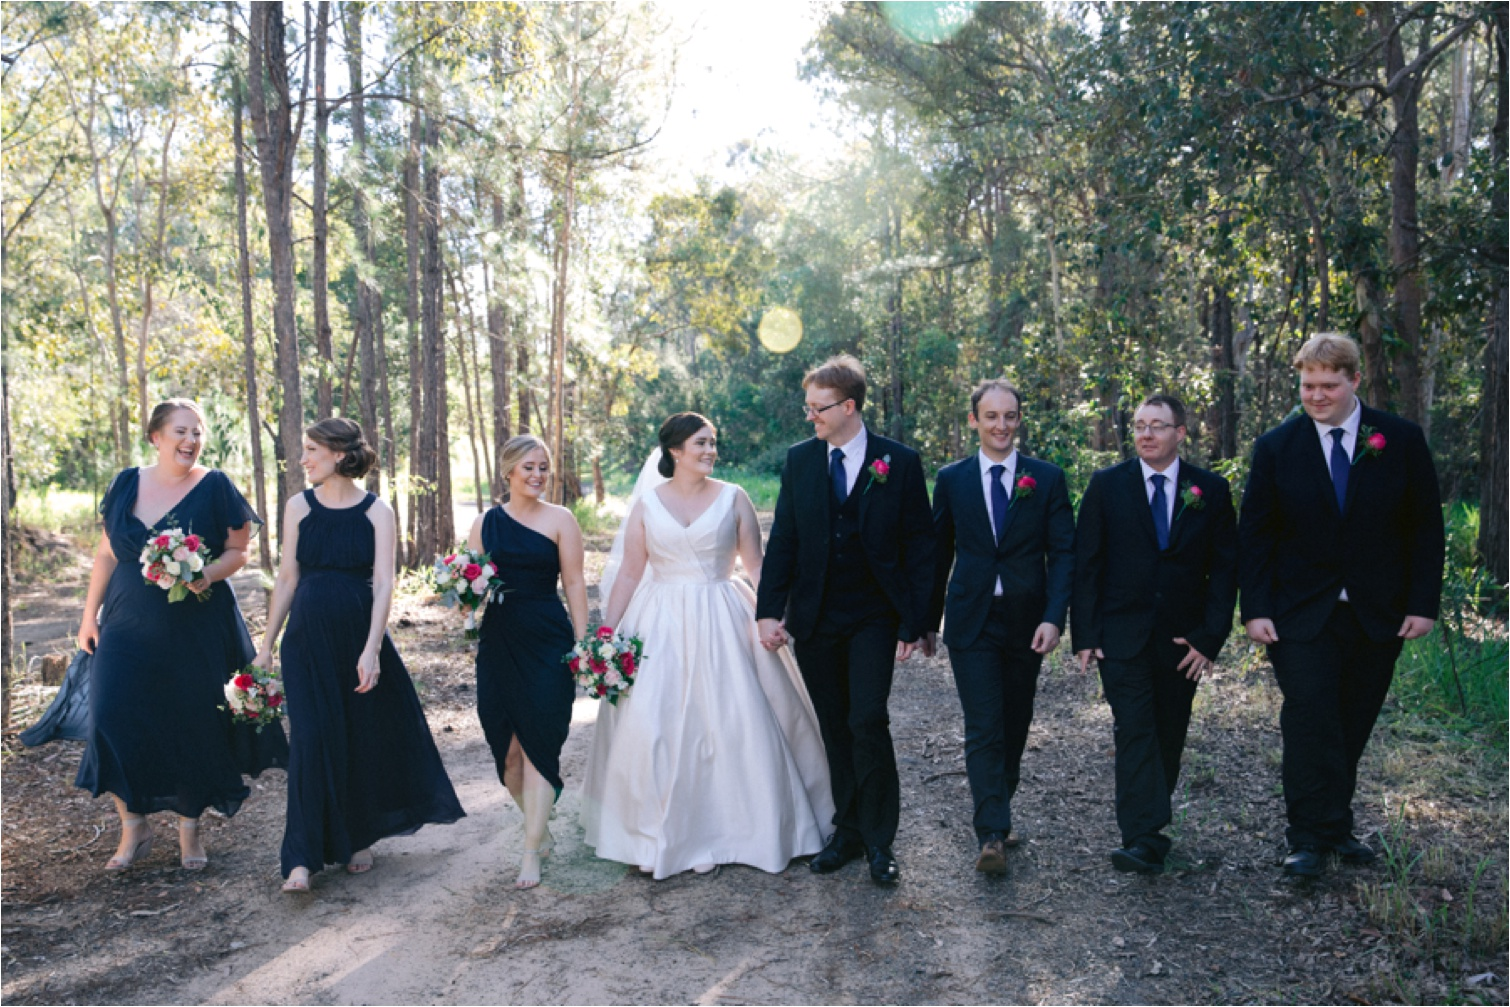 Bridal_party_walking_Wedding_Photography